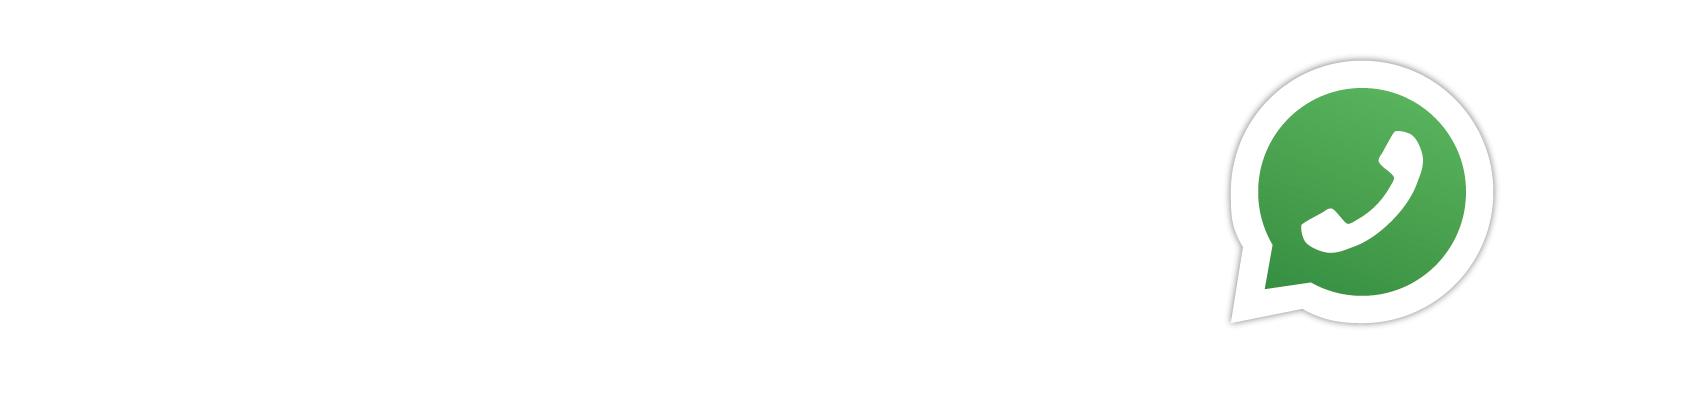 Icono-chat_2